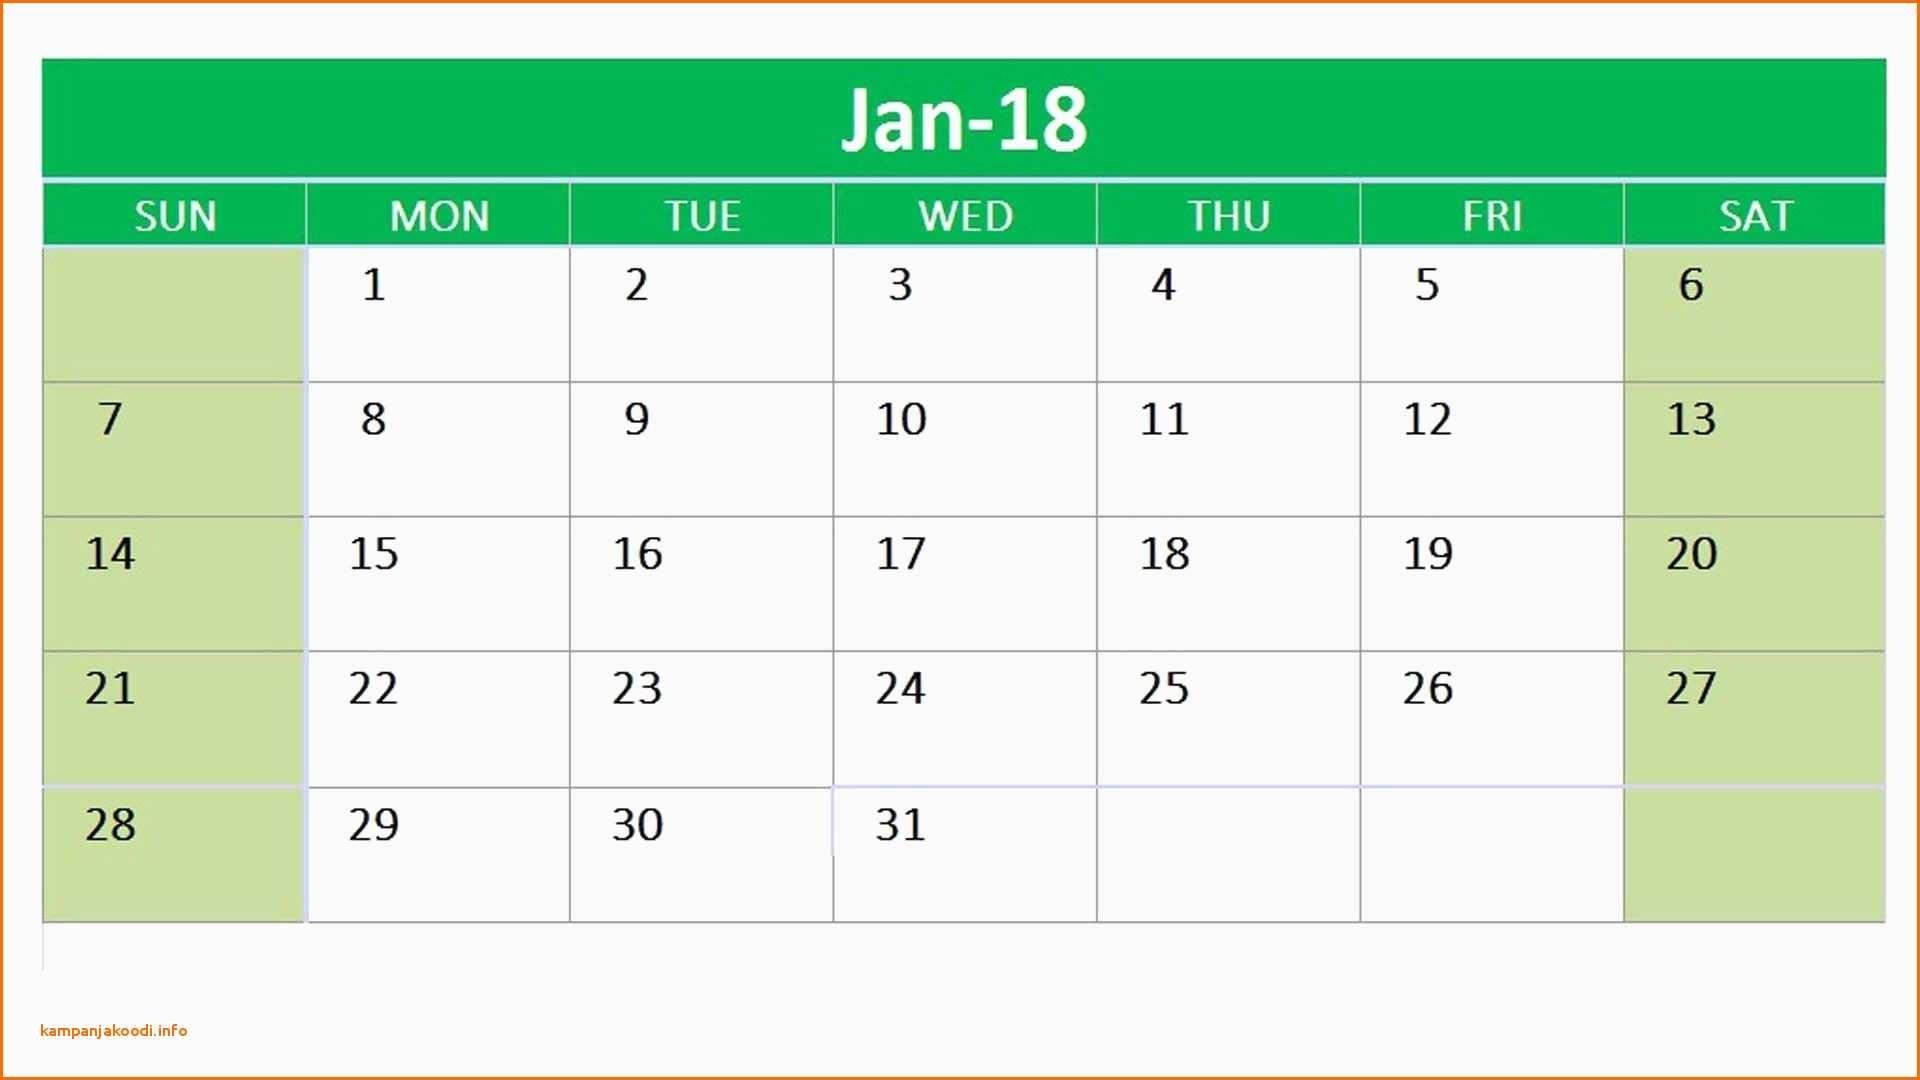 March Calendar 2018 Recientes Printable Calendars Fitness Calendar Template New Free Printable Of March Calendar 2018 Más Recientes Calendar Template to Print Luxury Chore Chart Unique Chore Calendar